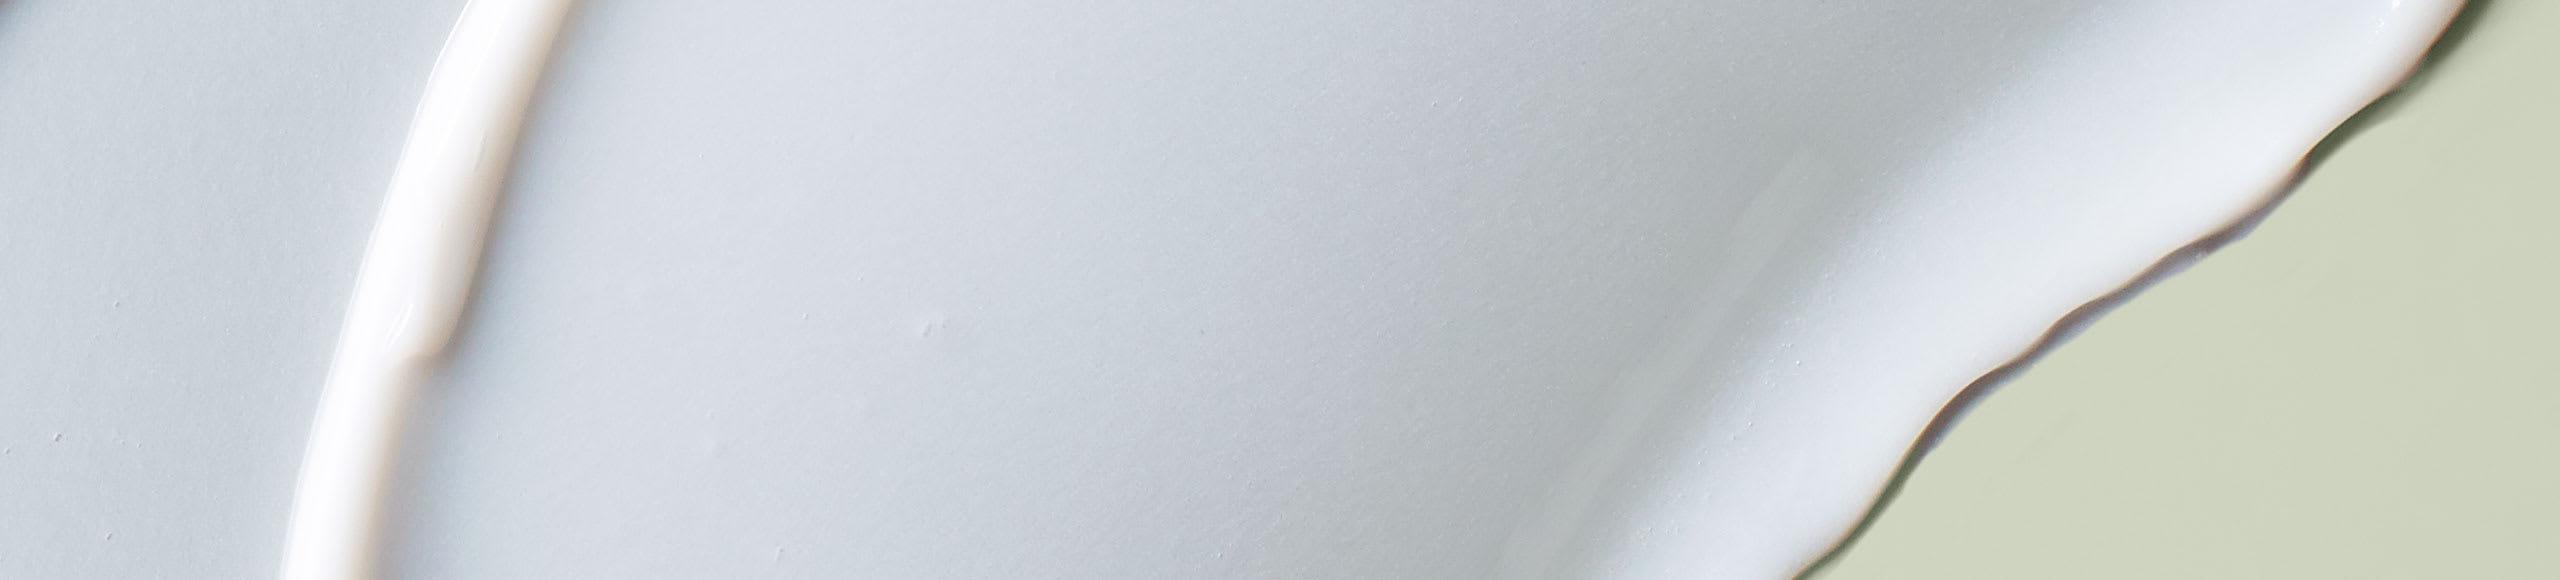 white goop on plain sage background